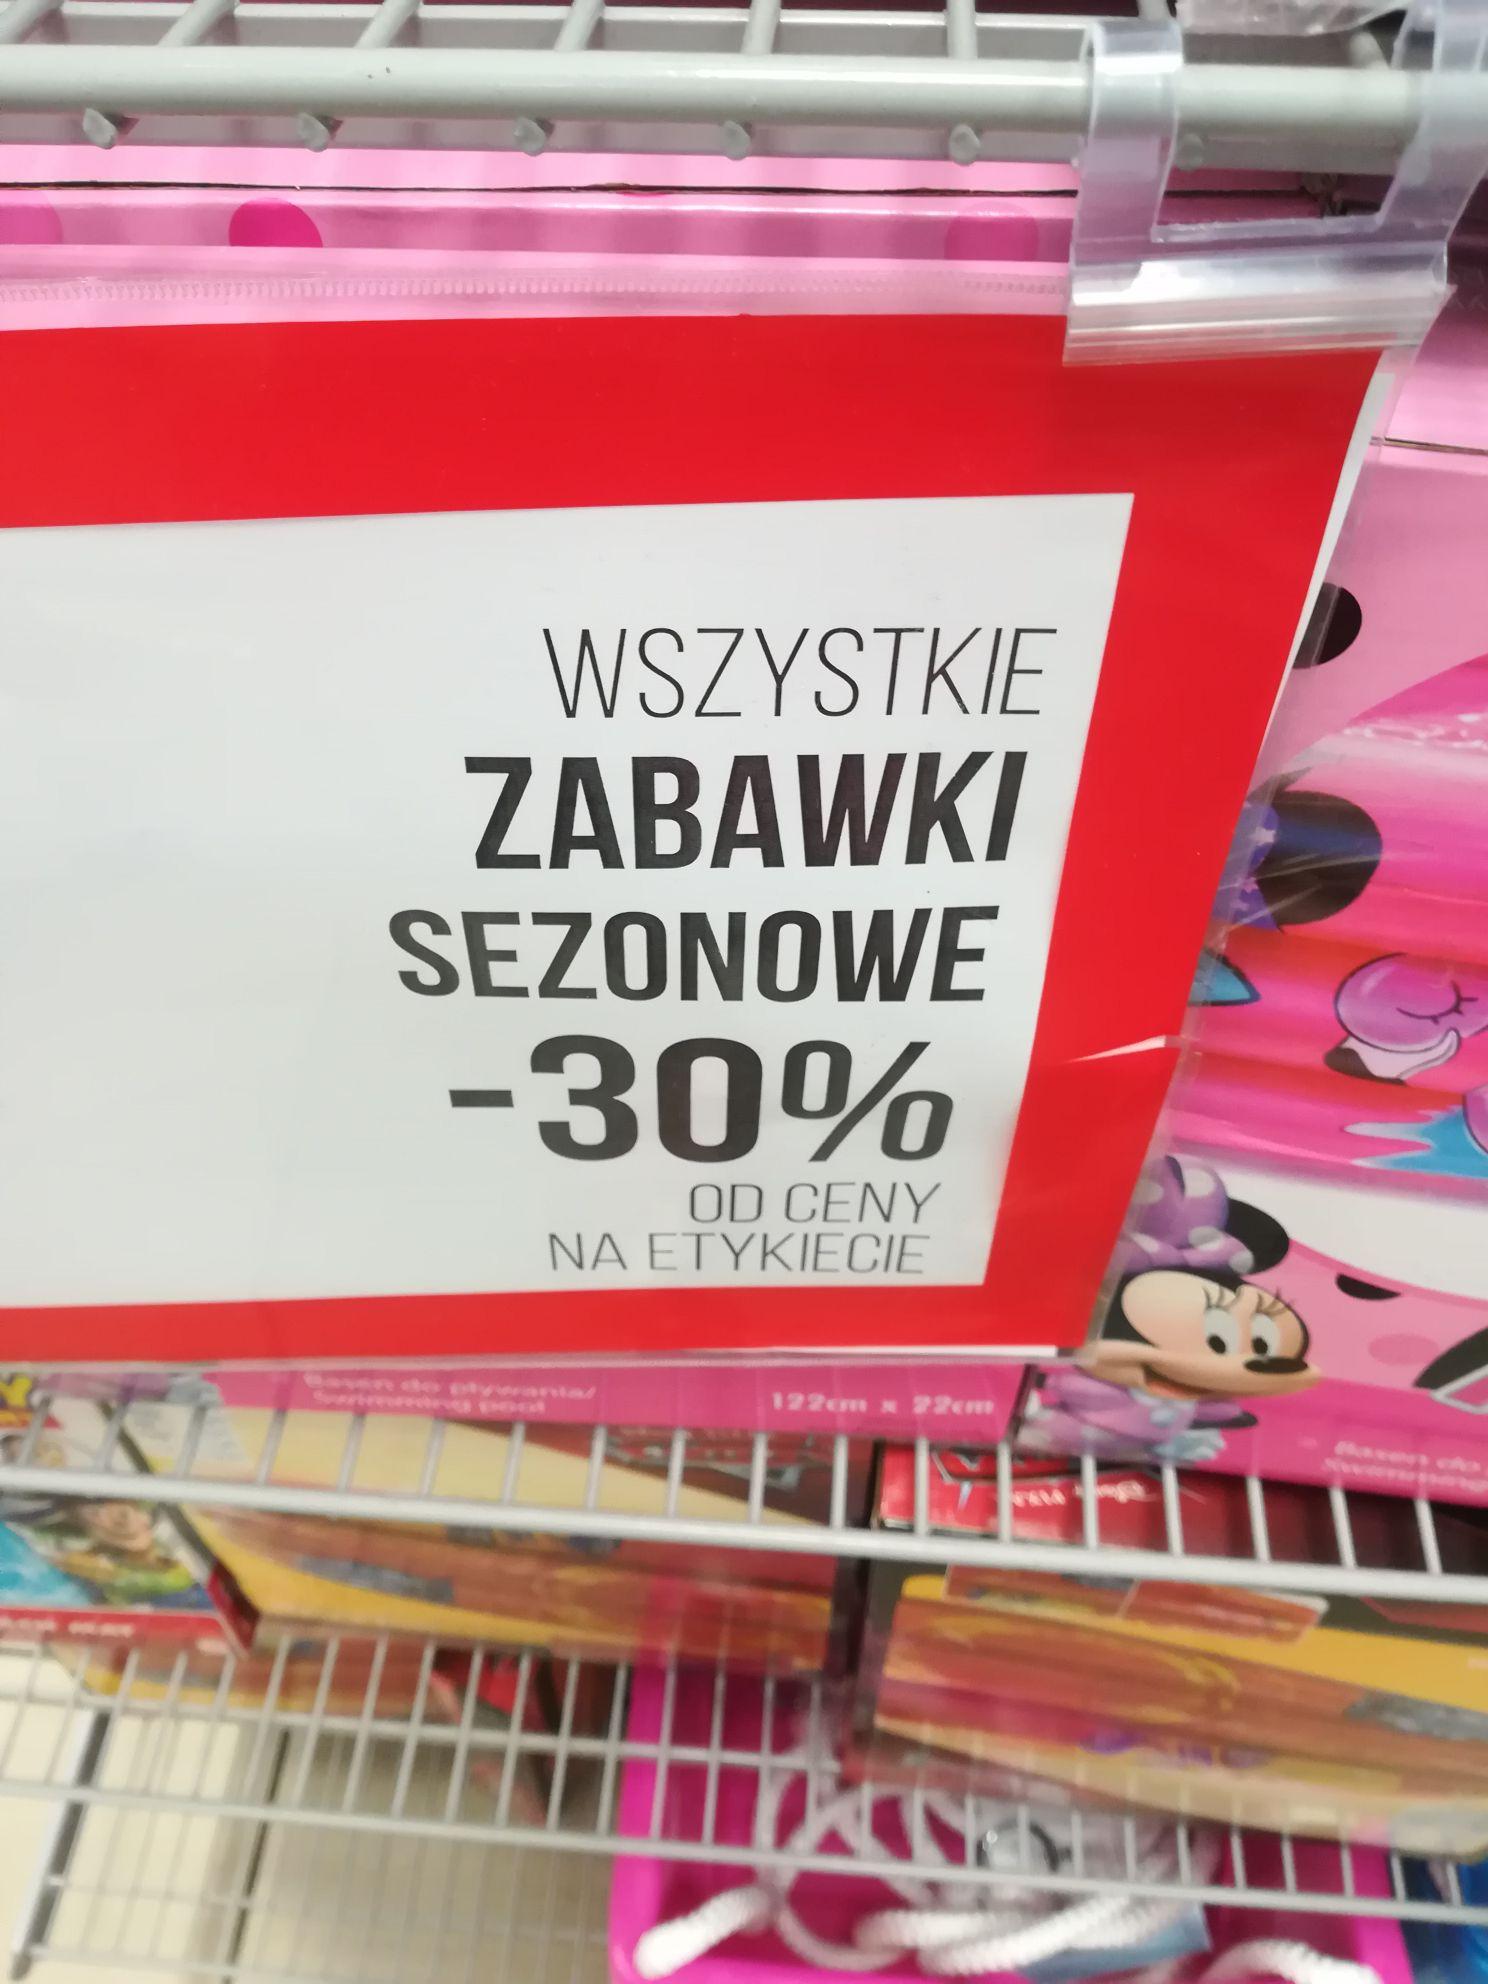 Pepco - 30% na zabawki sezonowe i bańki mydlane